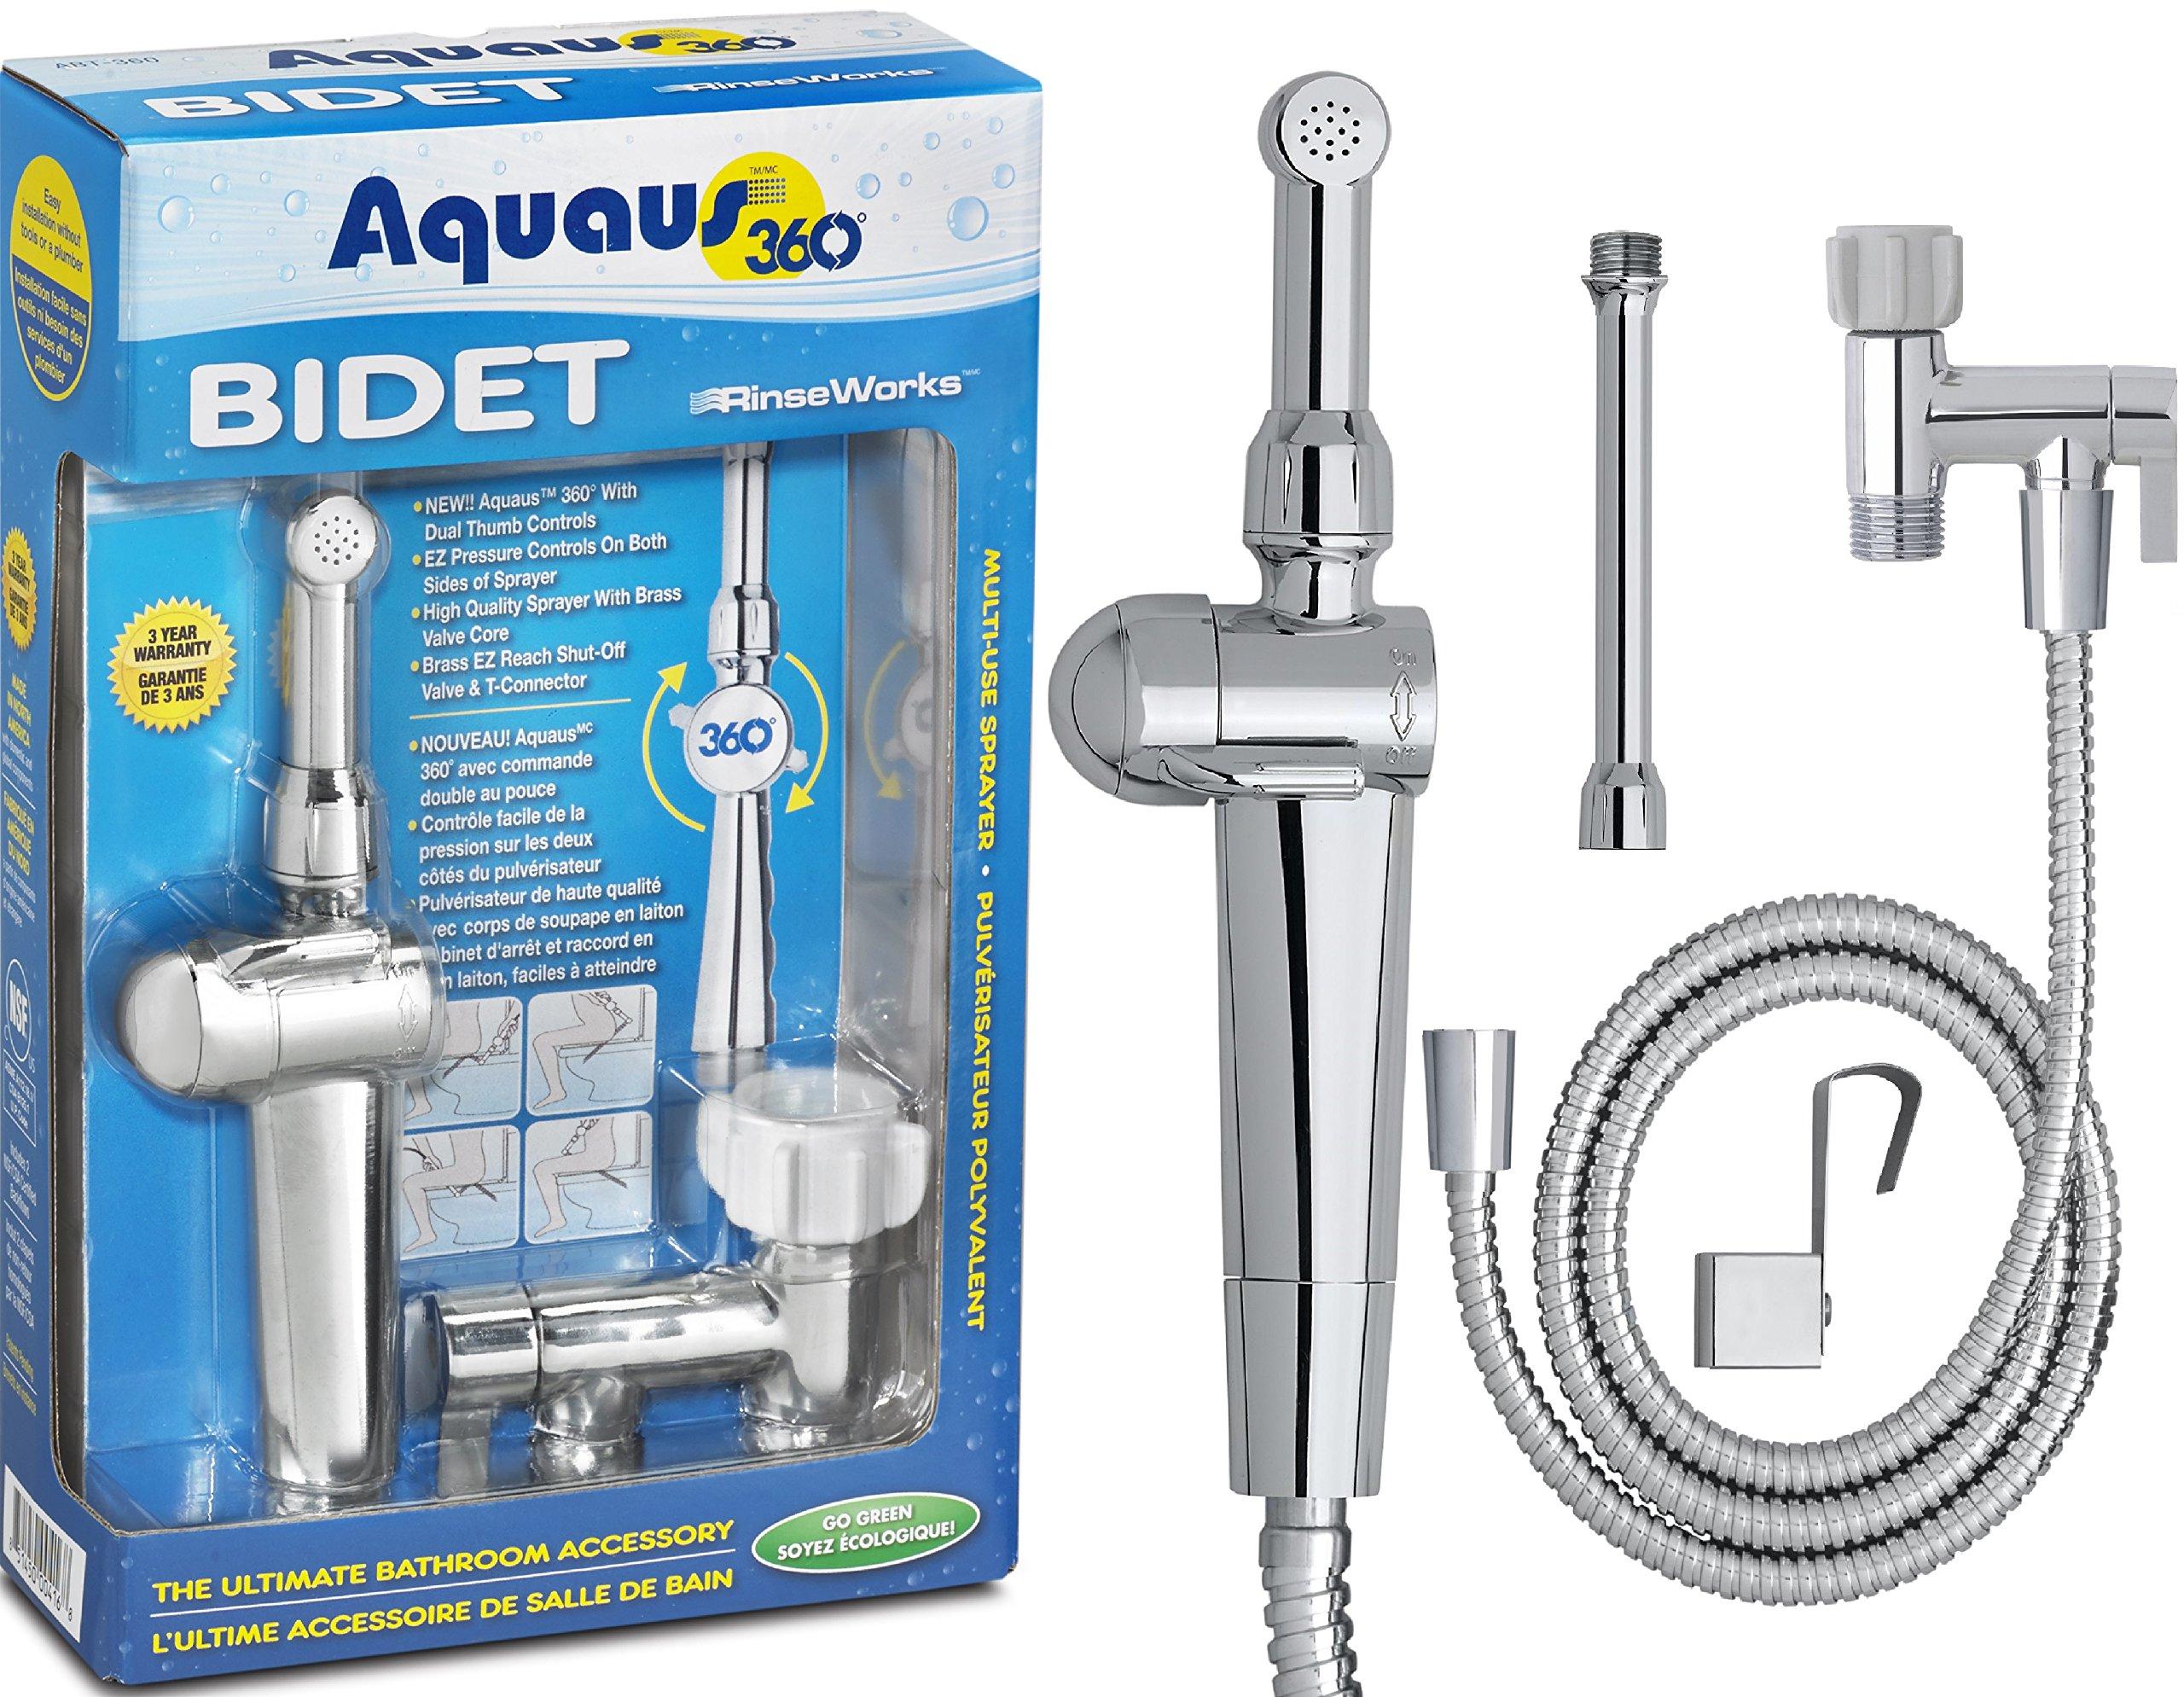 Rinseworks Aquaus 360 Hand Held Bidet Sprayer For Toilet Shattaf